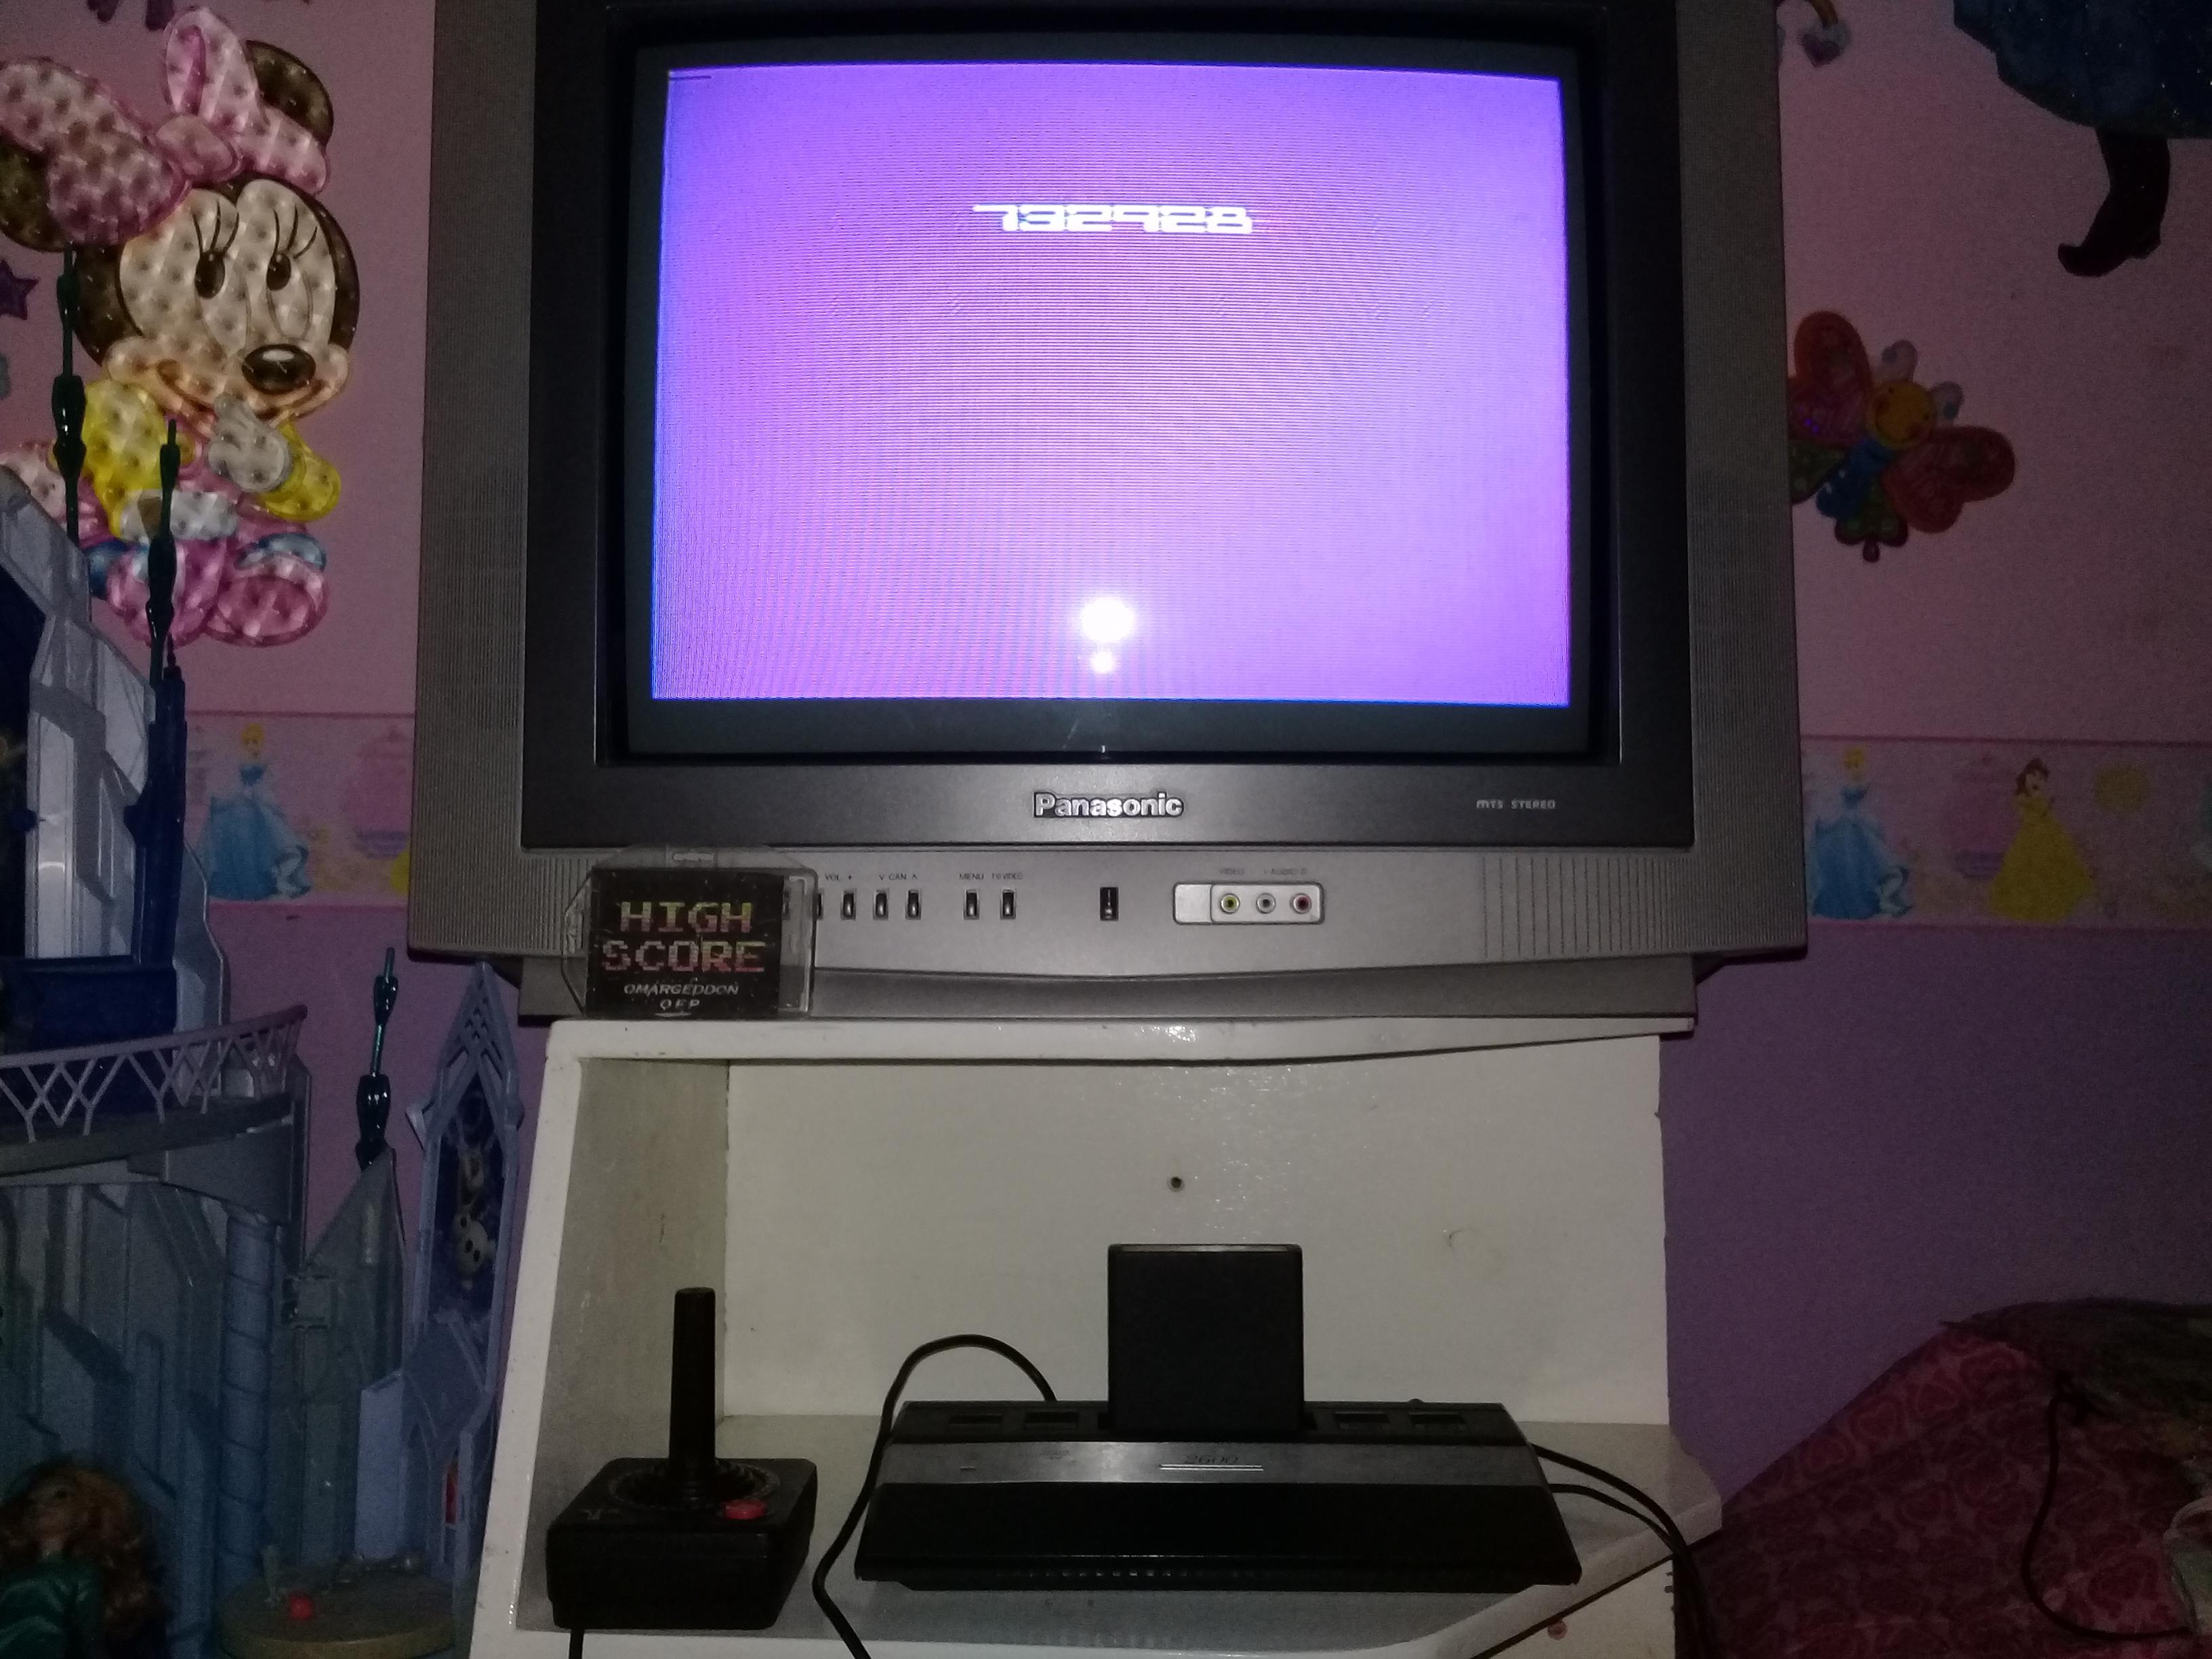 omargeddon: Yars Revenge: Game 6 (Atari 2600 Novice/B) 732,928 points on 2019-06-03 14:10:04